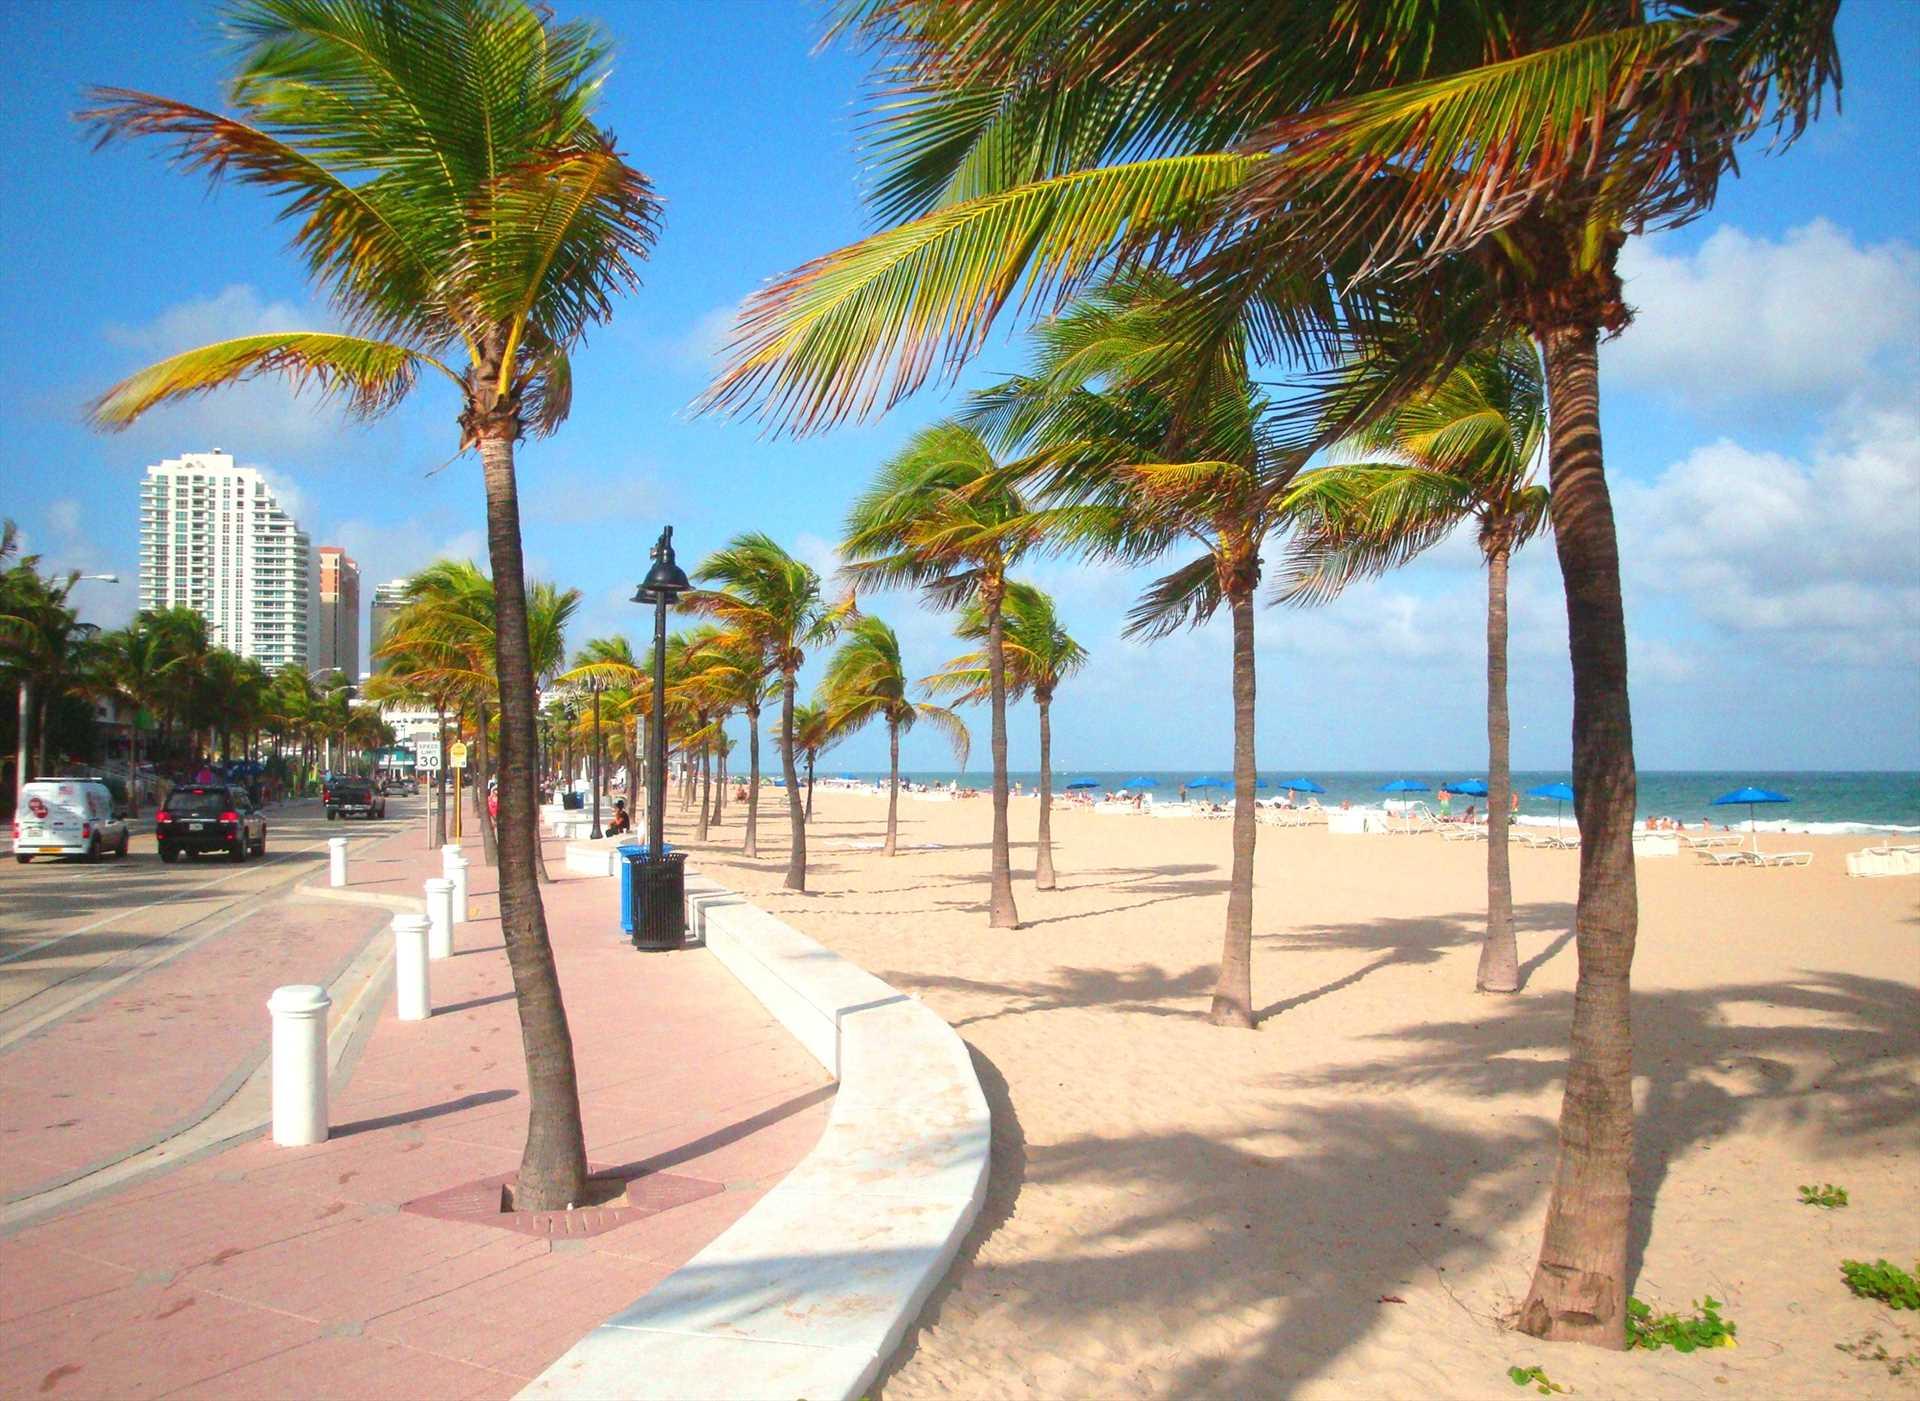 Newly landscaped Lauderdale beach is beautiful.